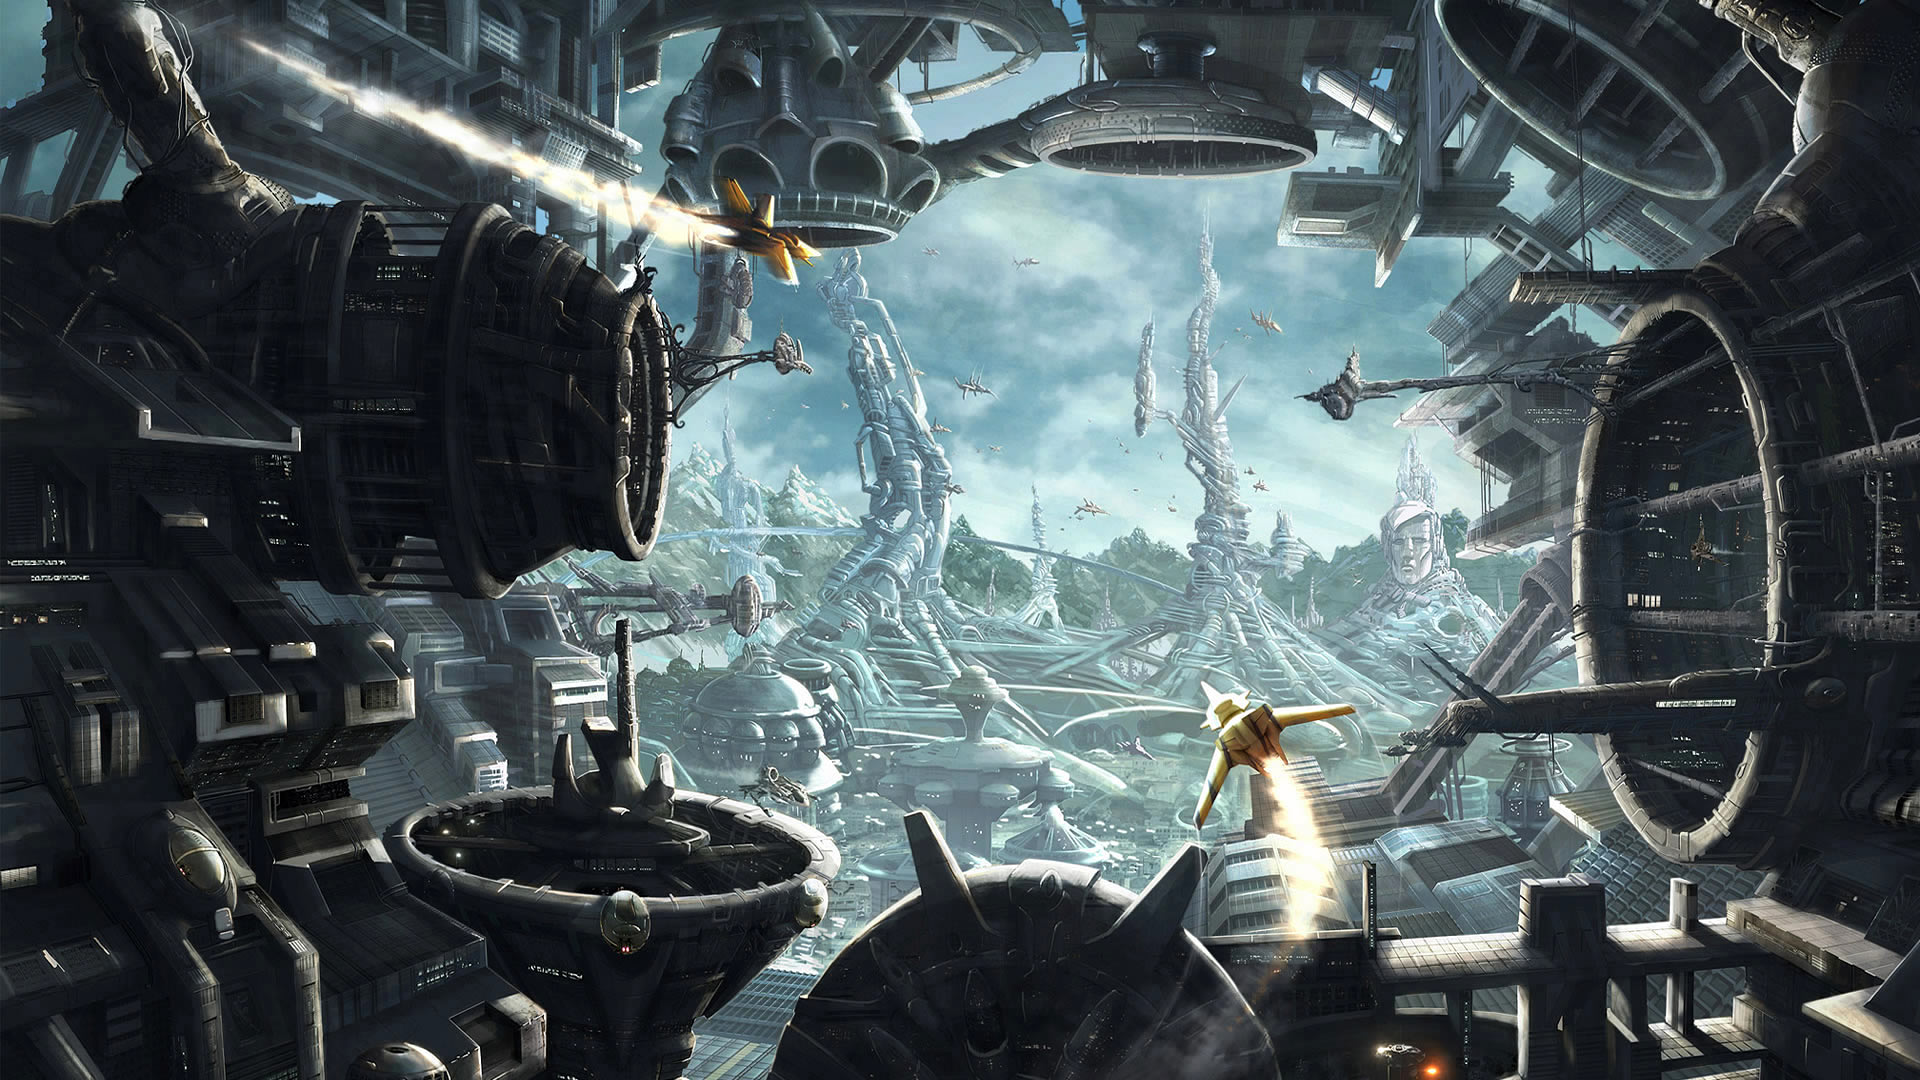 Sci fi wallpaper of the week 9   Concept art Digital 1920x1080